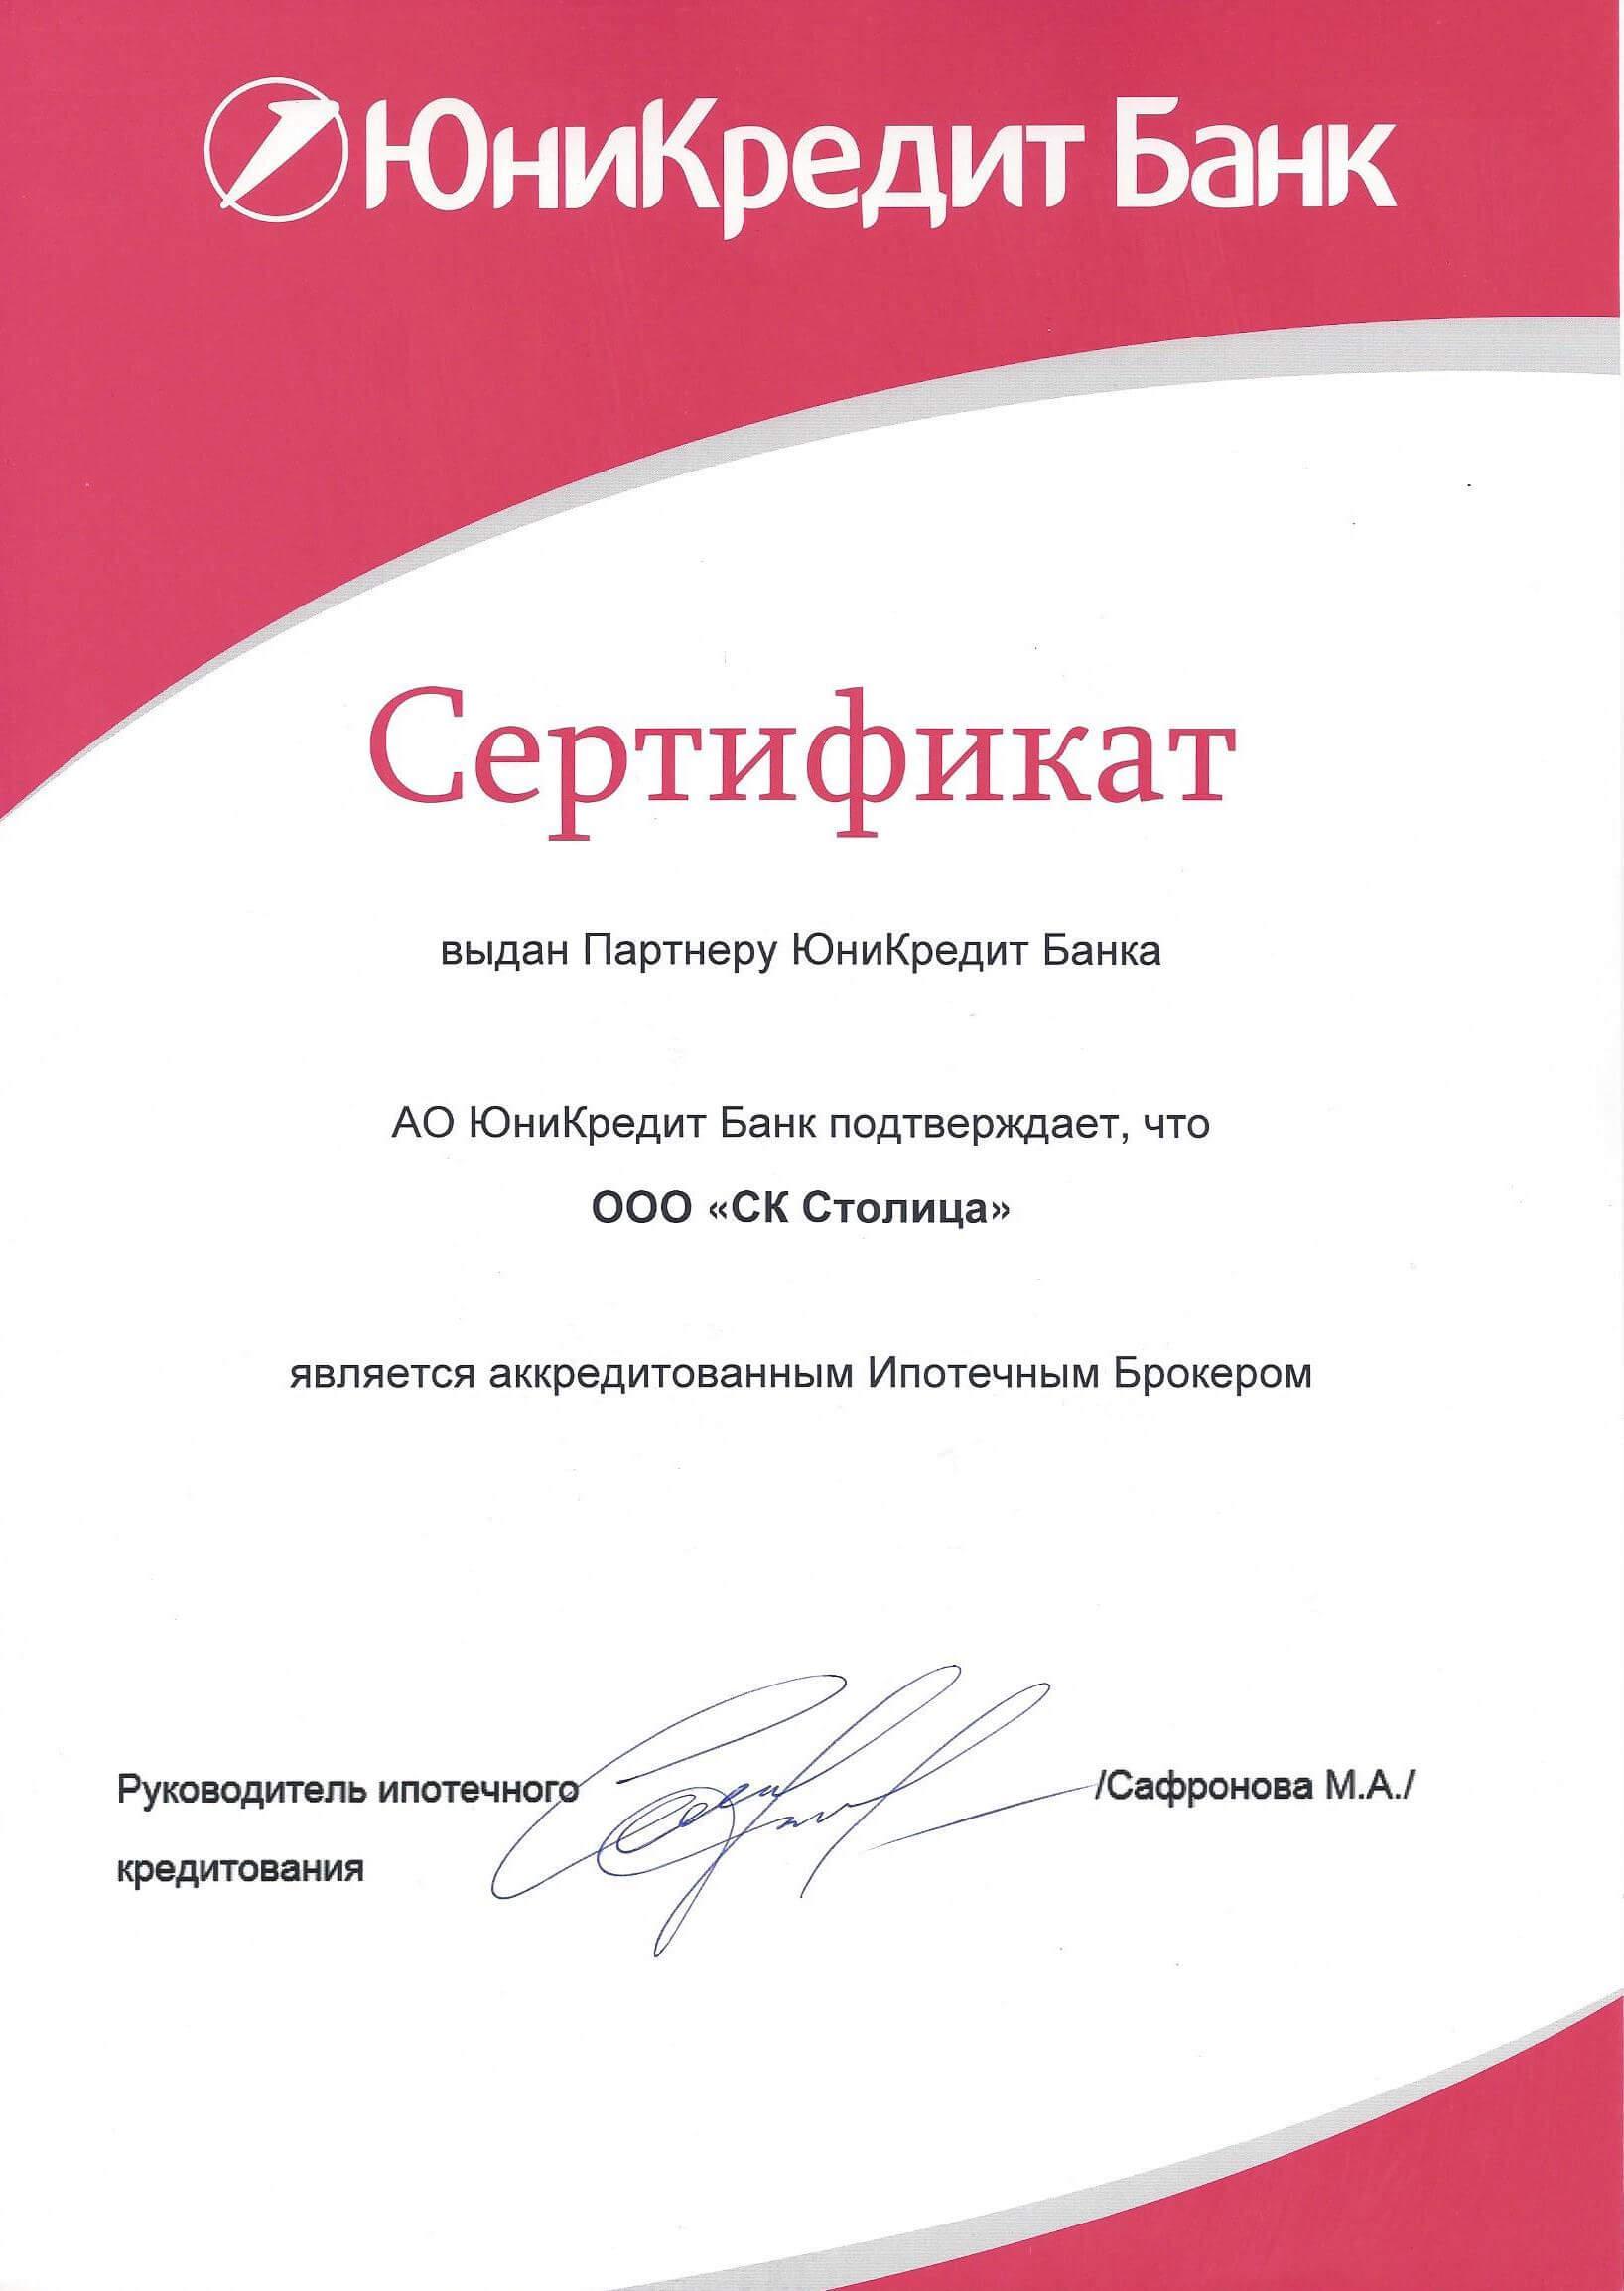 Сертификат ЮниКредит Банк